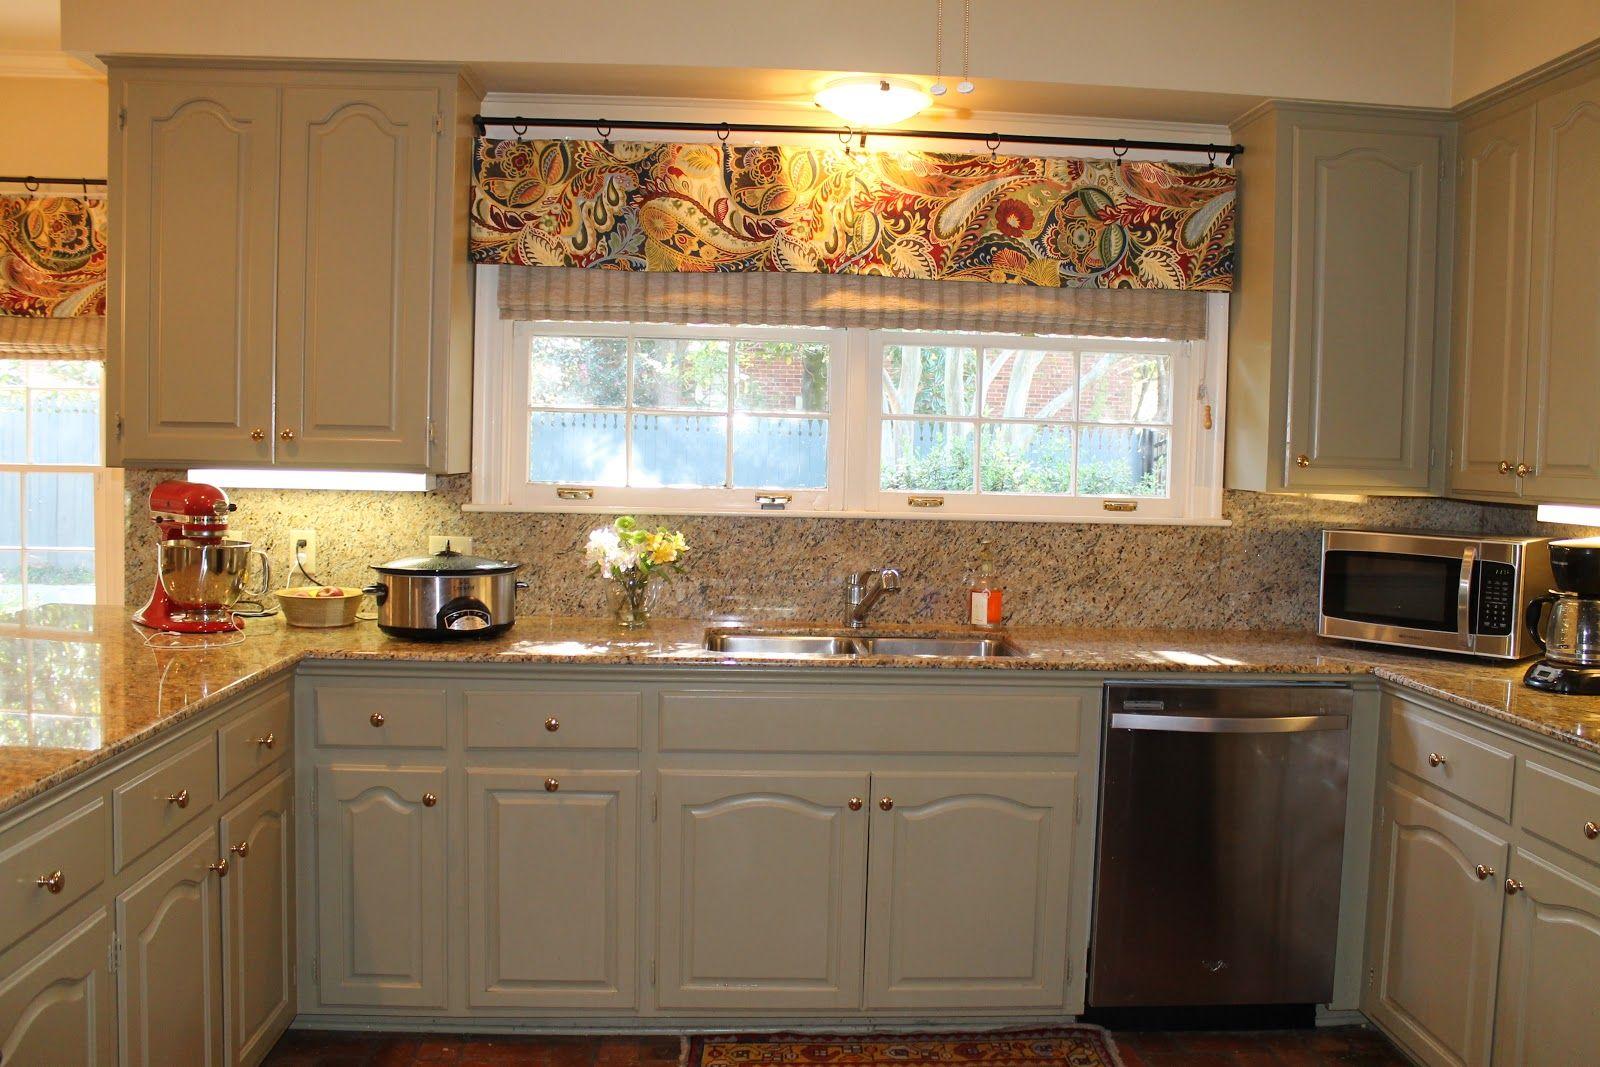 Seamingly Smitten How To Sew A Kitchen Valance Mini Tutorial Modern Kitchen Valance Modern Kitchen Window Kitchen Window Treatments